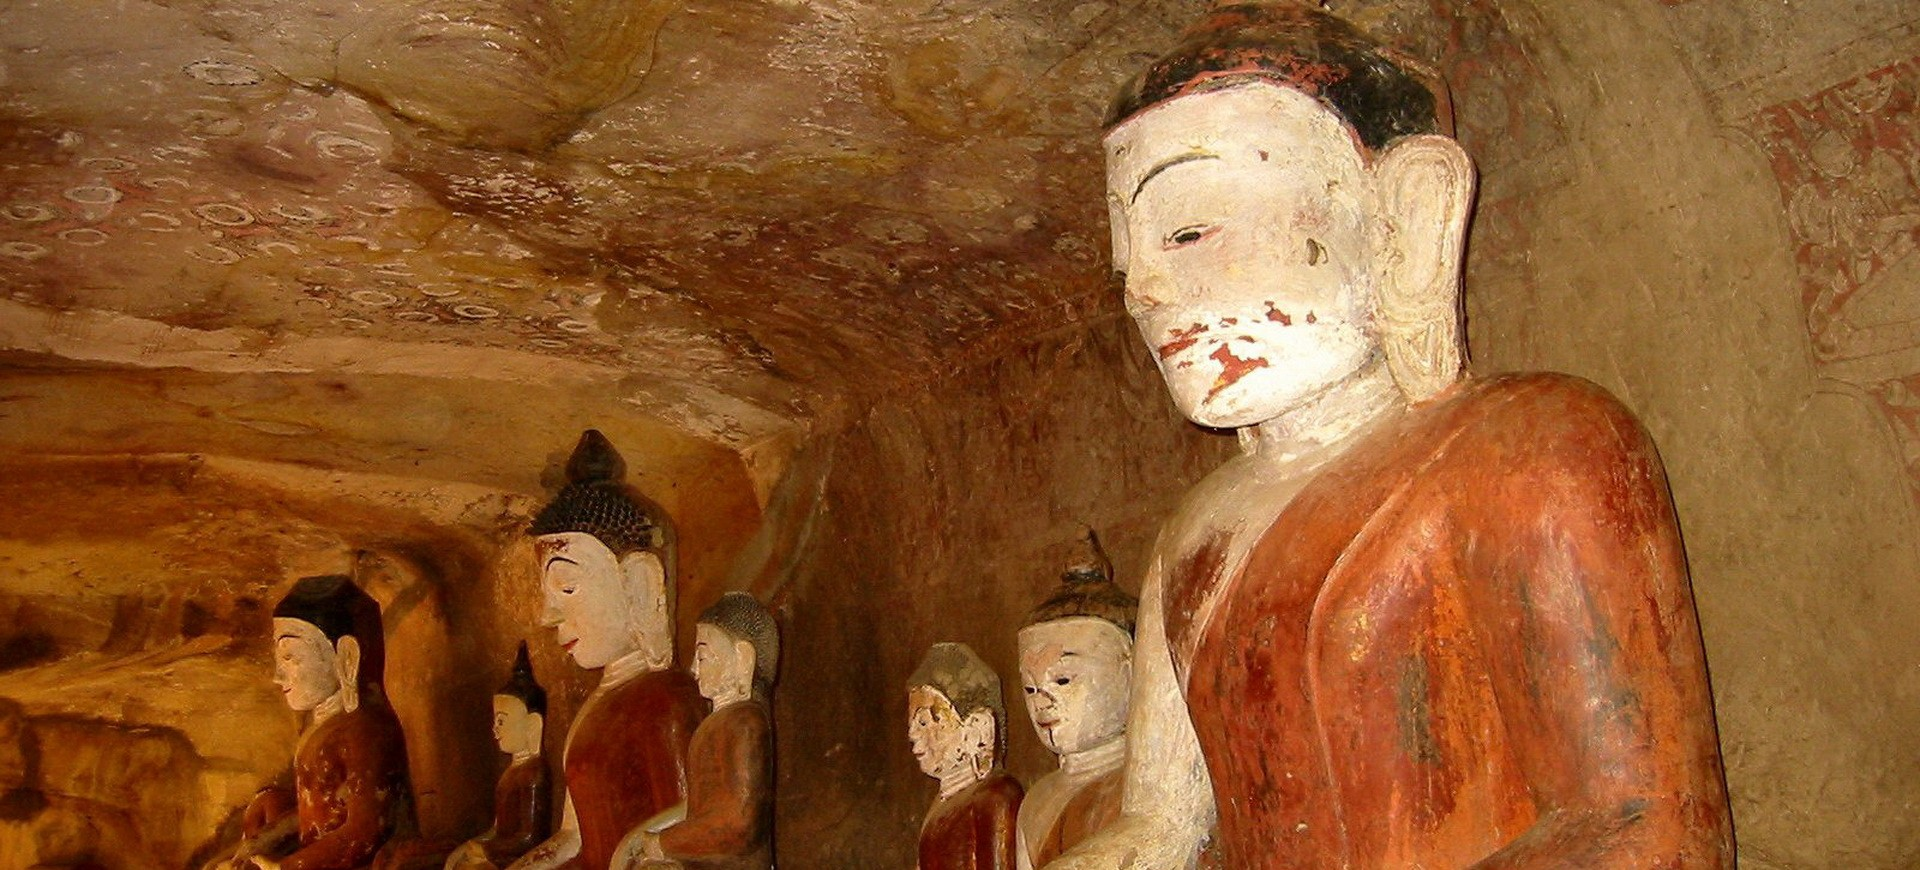 Birmanie Monywa Pagode